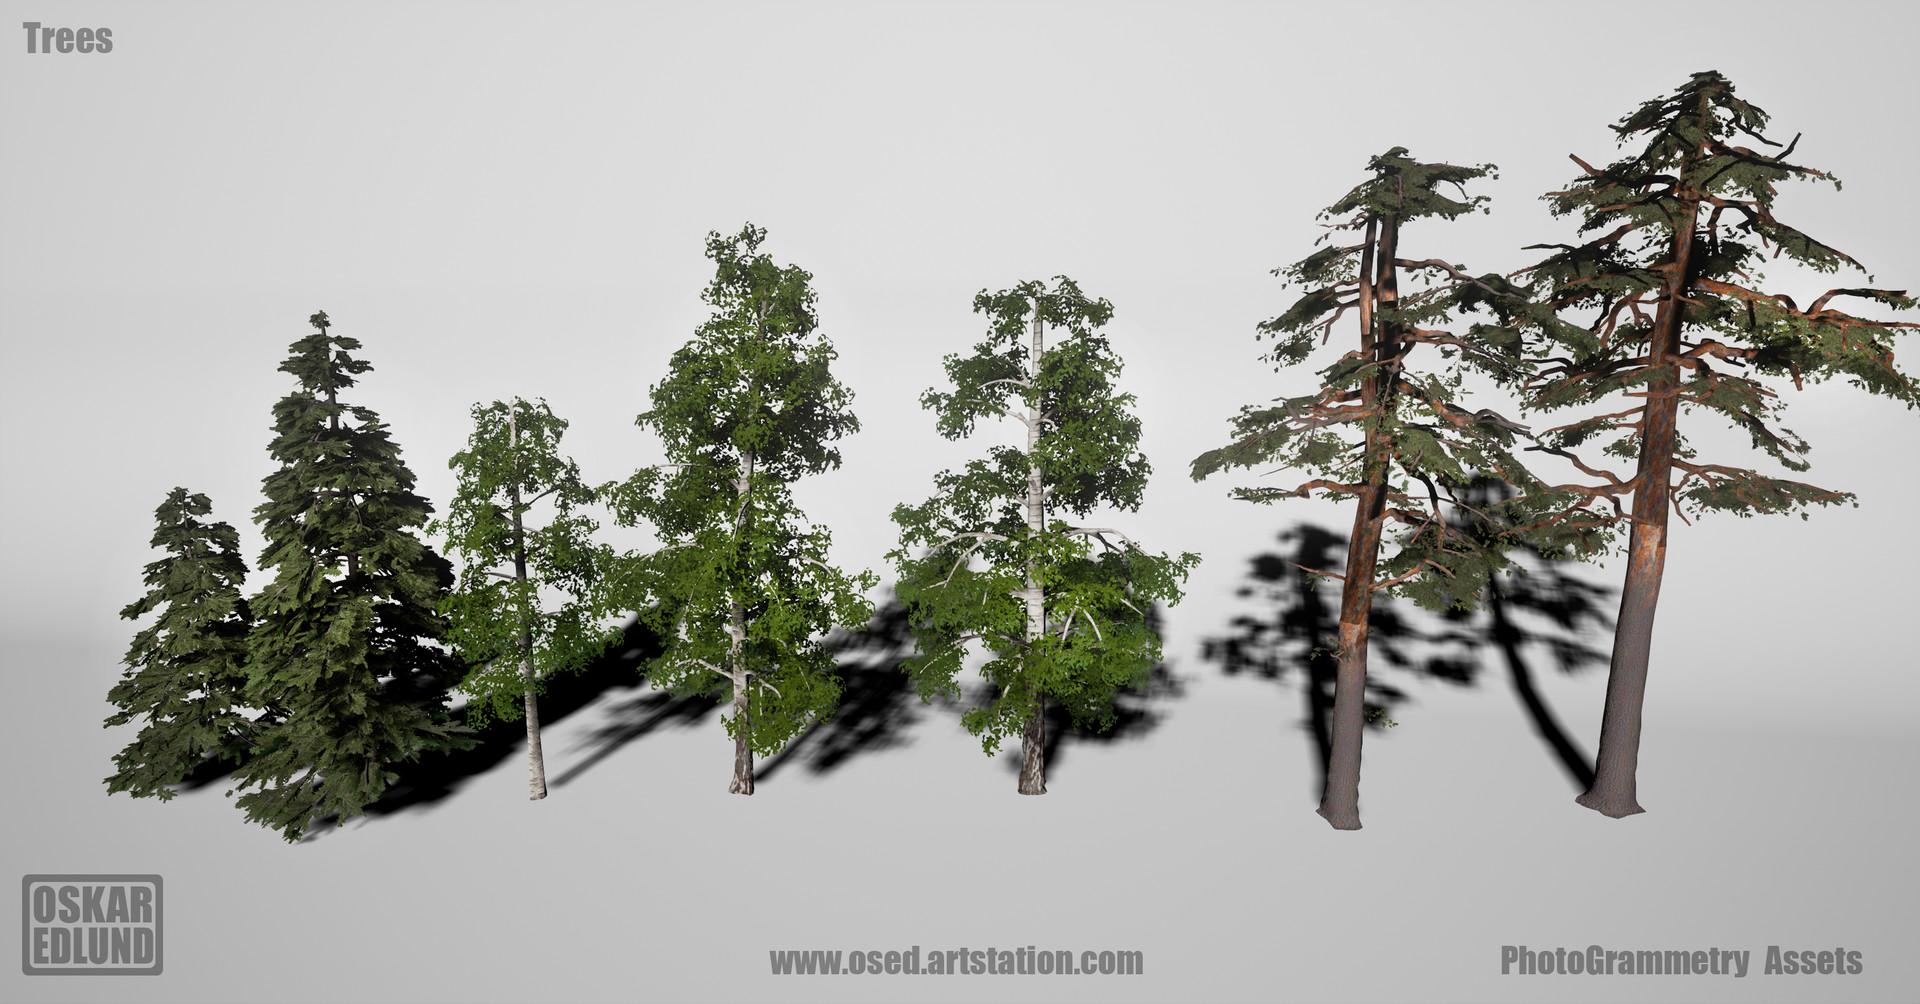 Oskar edlund trees